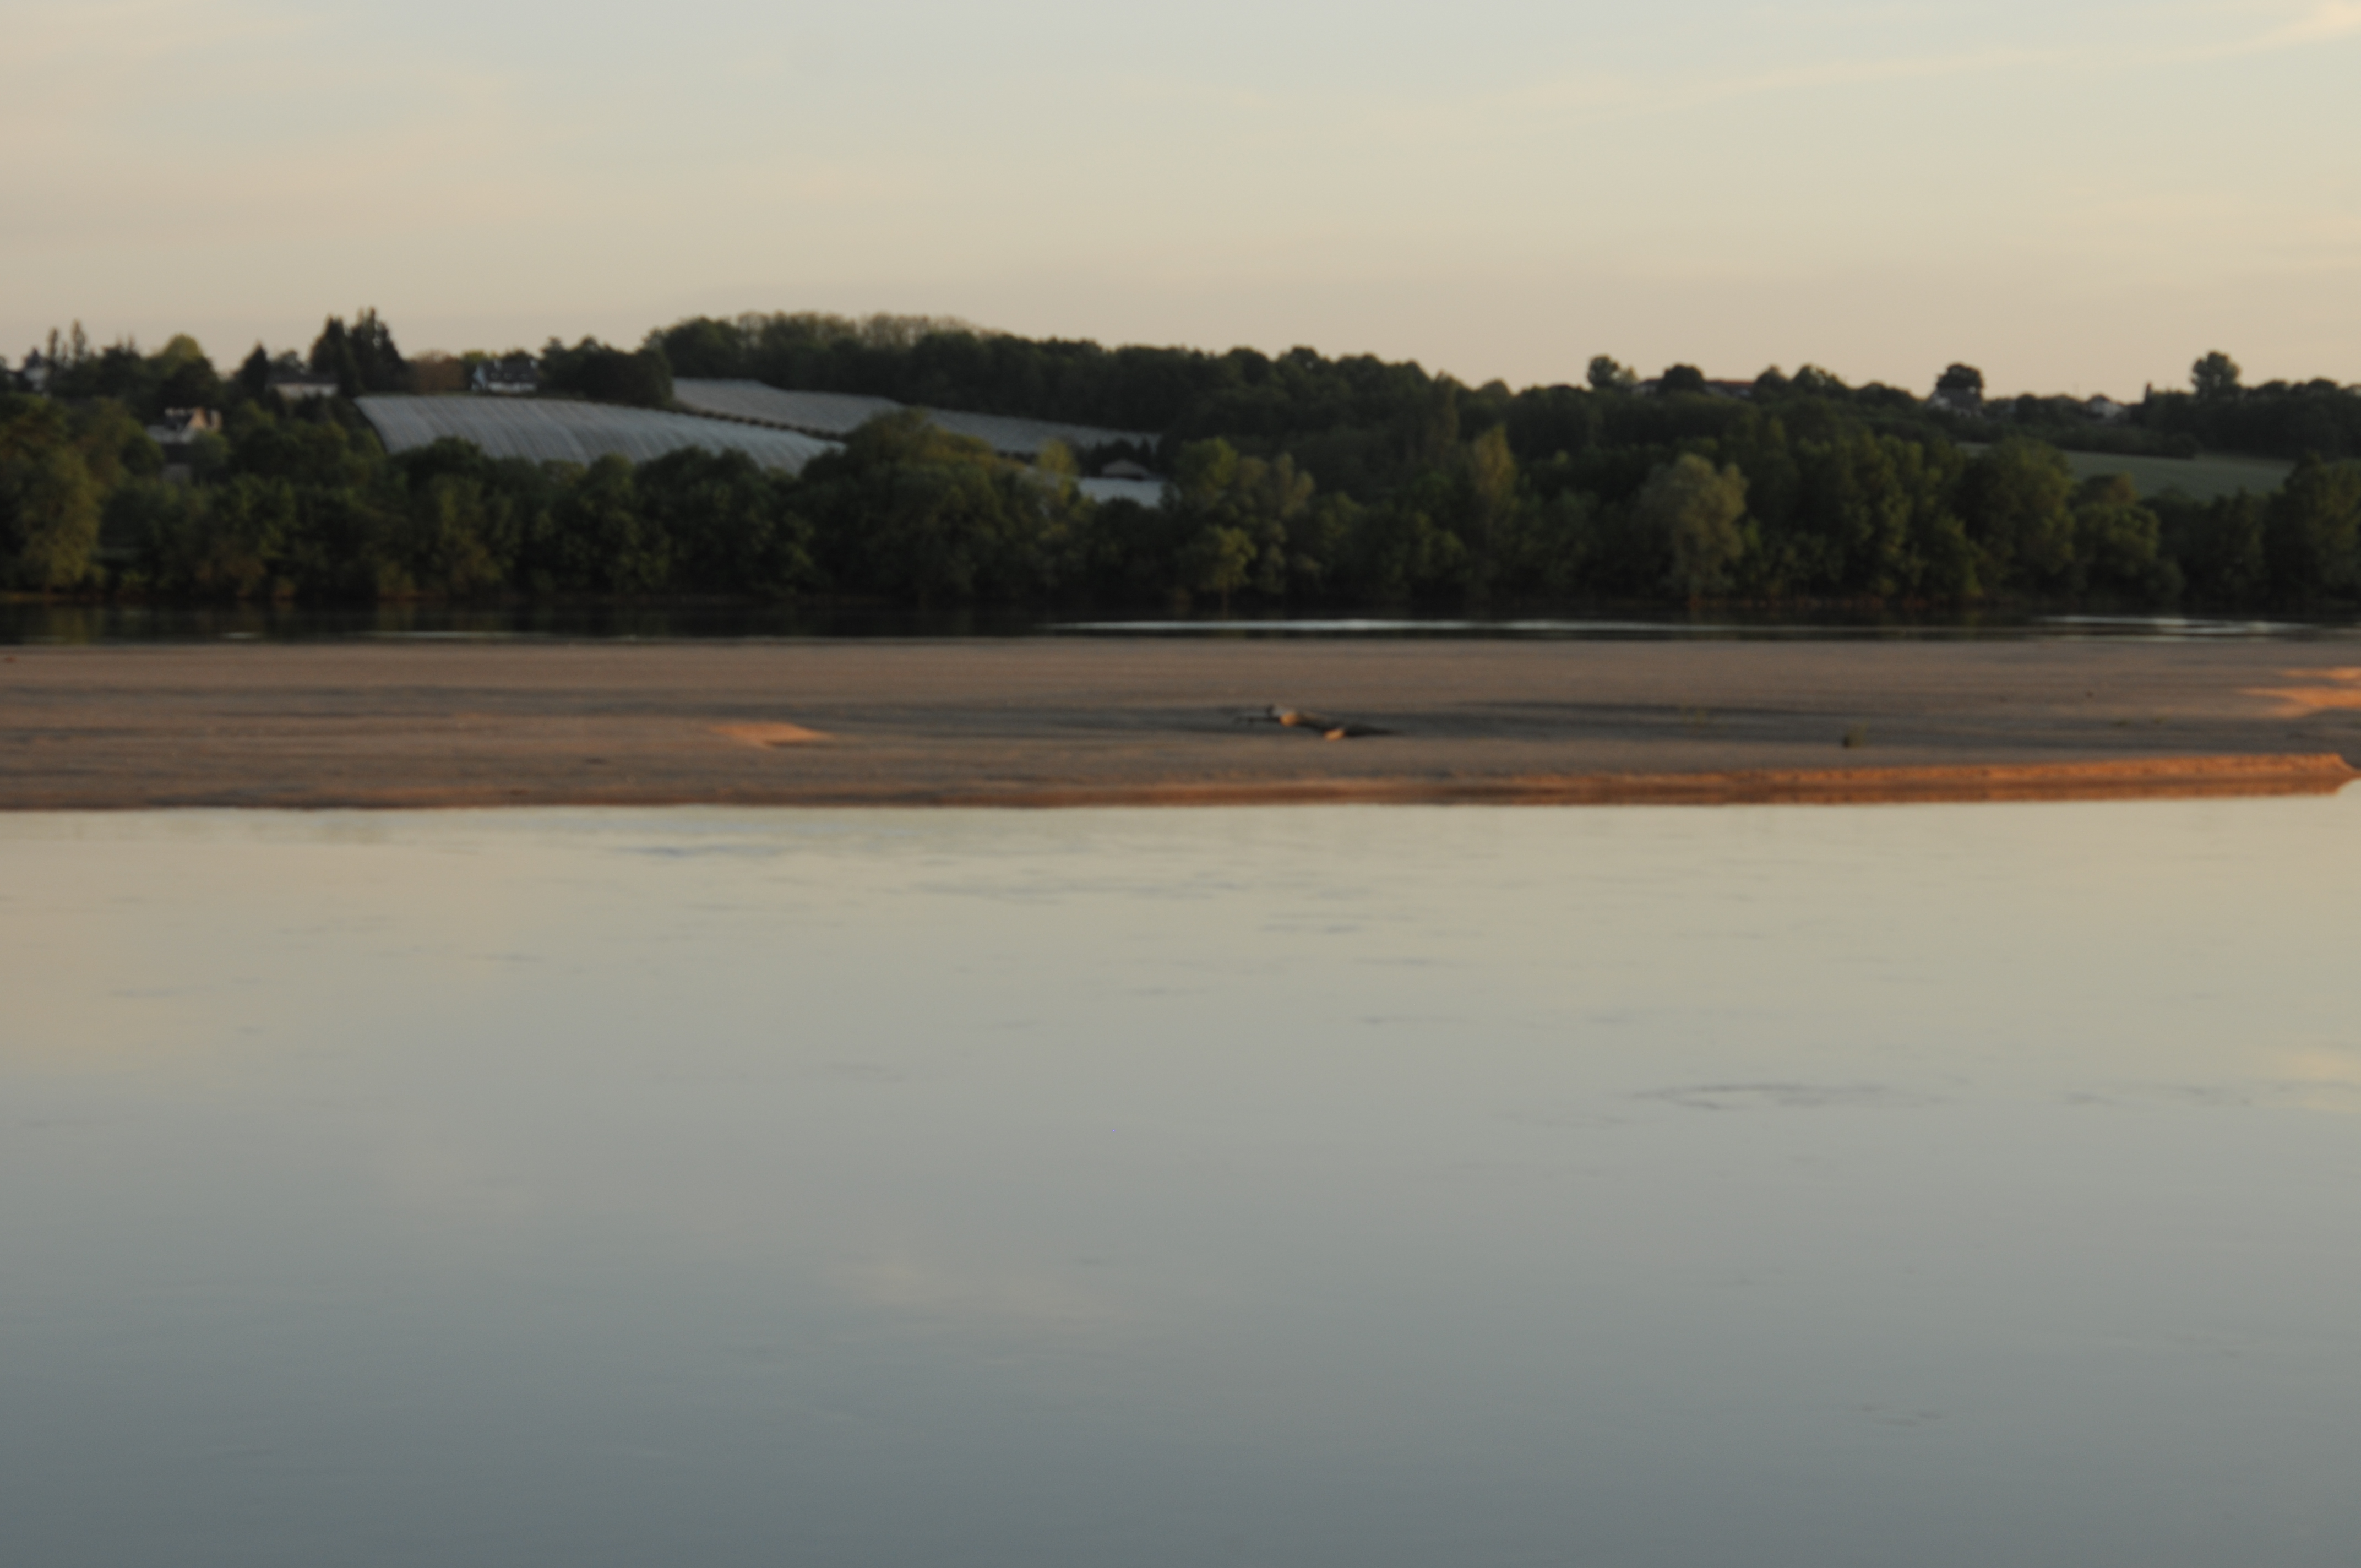 Saint-Mathurin-sur-Loire